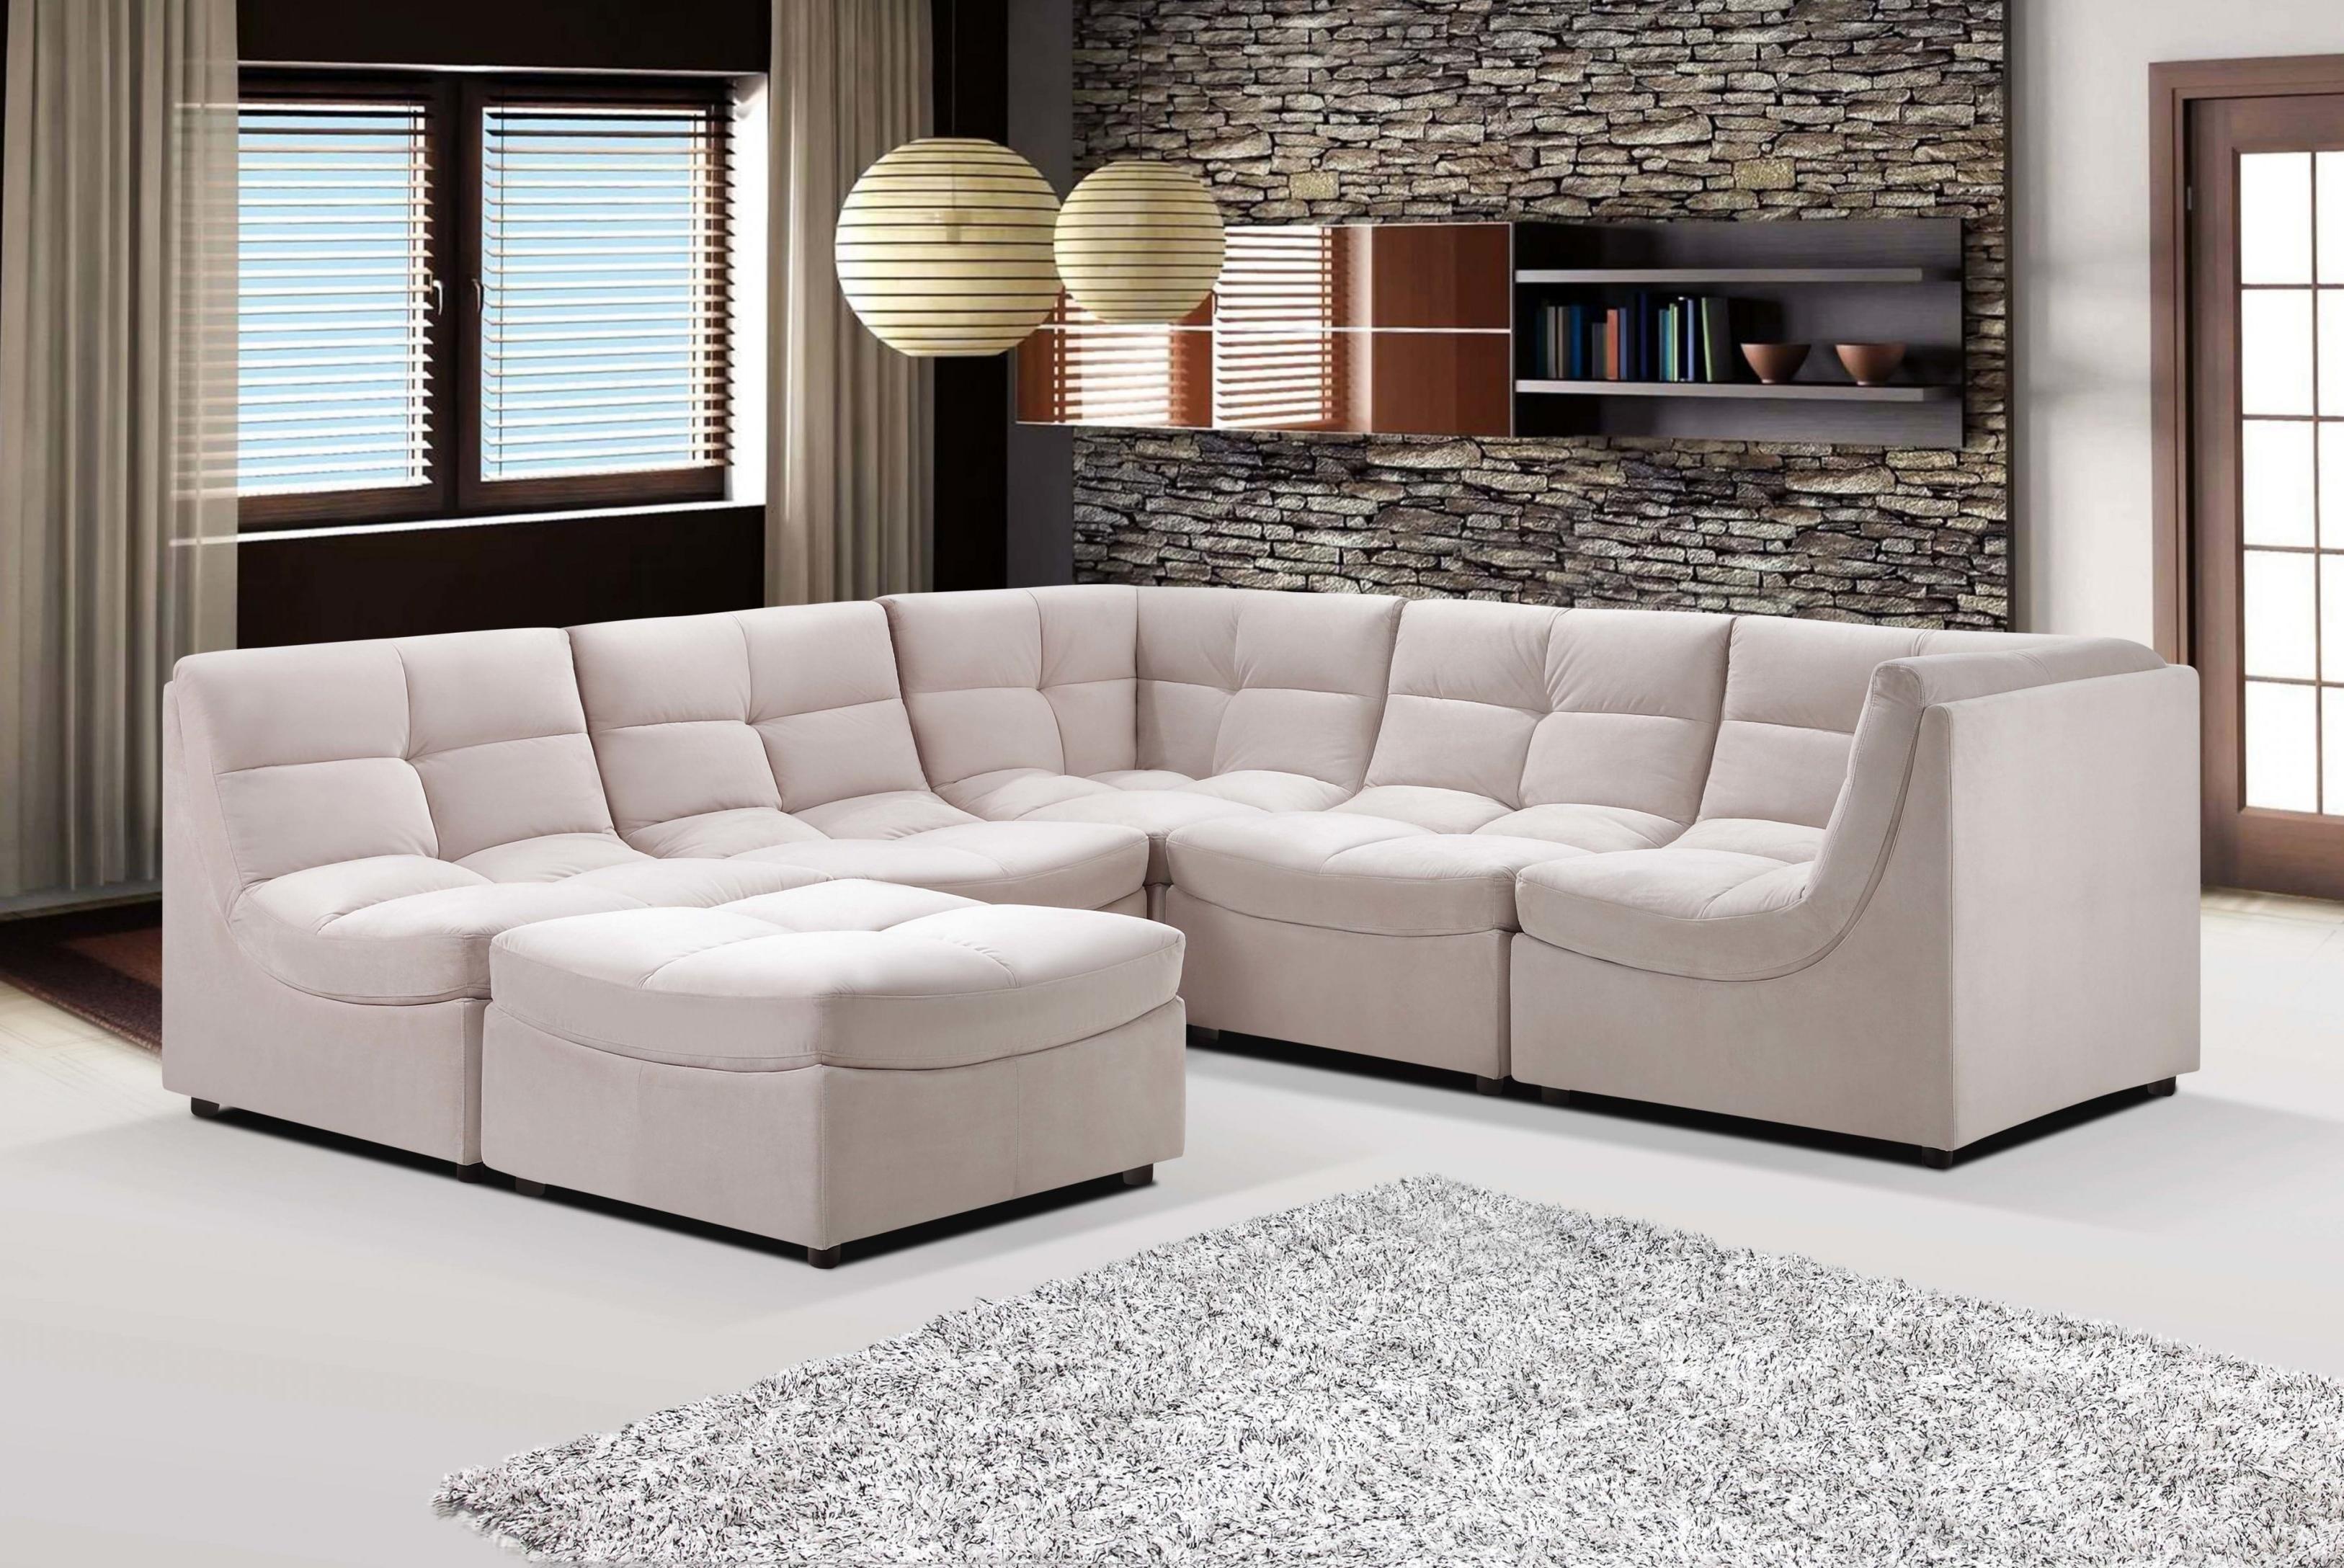 Small Modular Sectional Sofa 21 For Your Sofa Sectionals For Cloud For Current Small Modular Sectional Sofas (View 12 of 20)